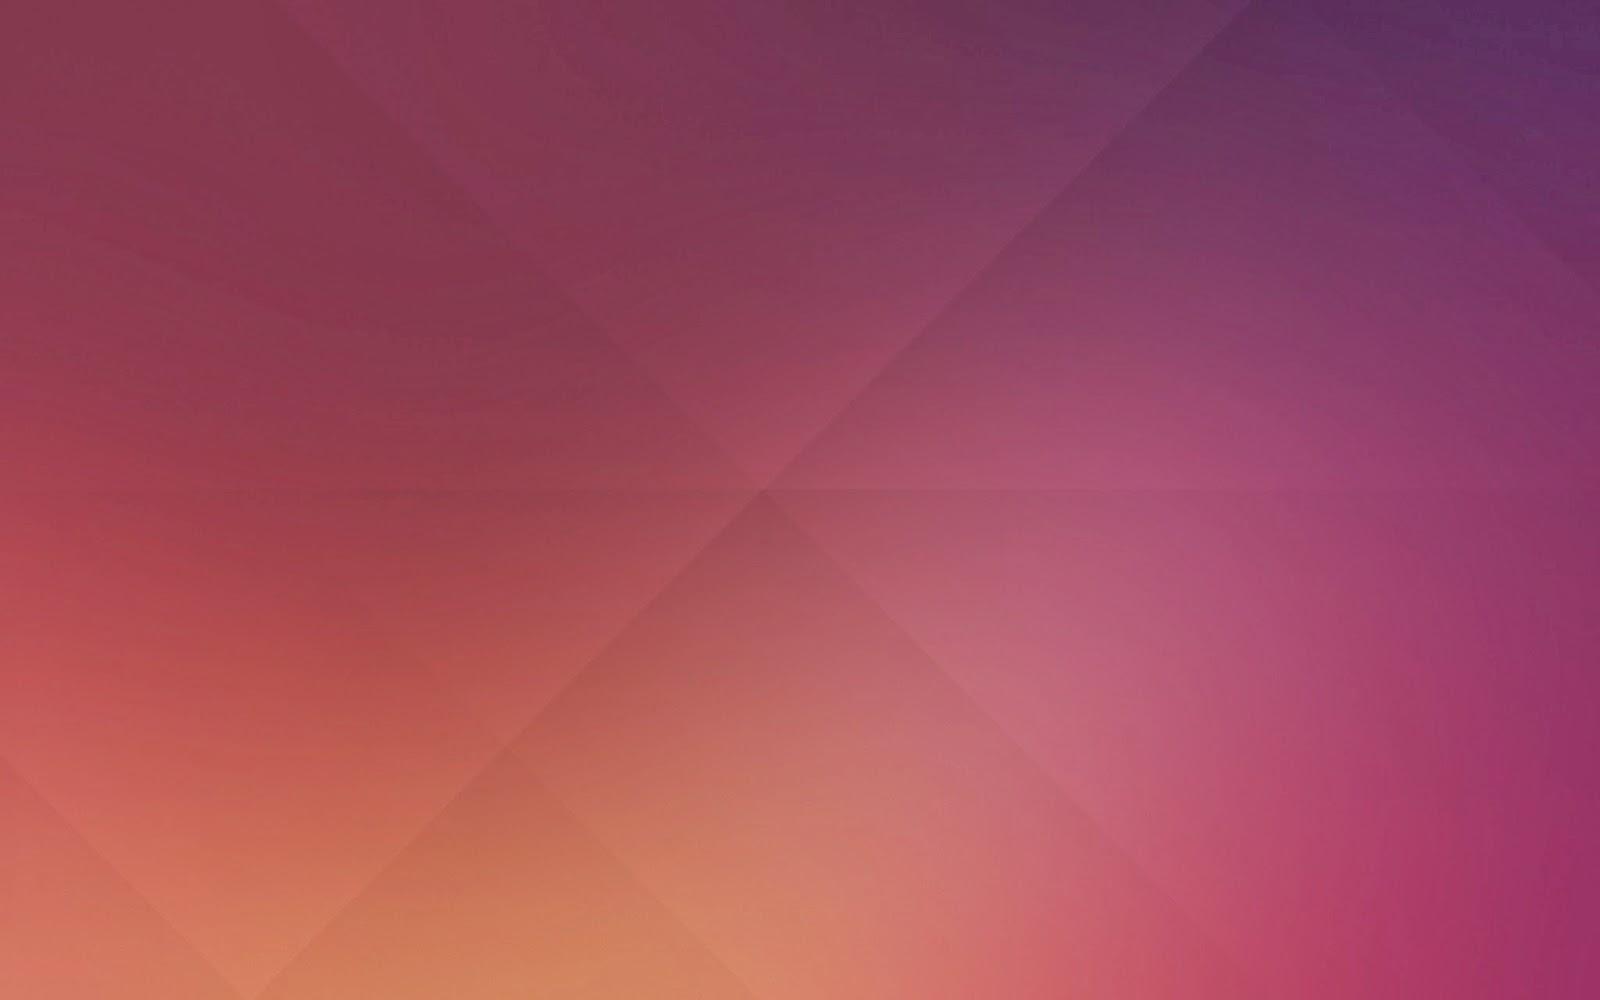 The default background of Ubuntu 14.04